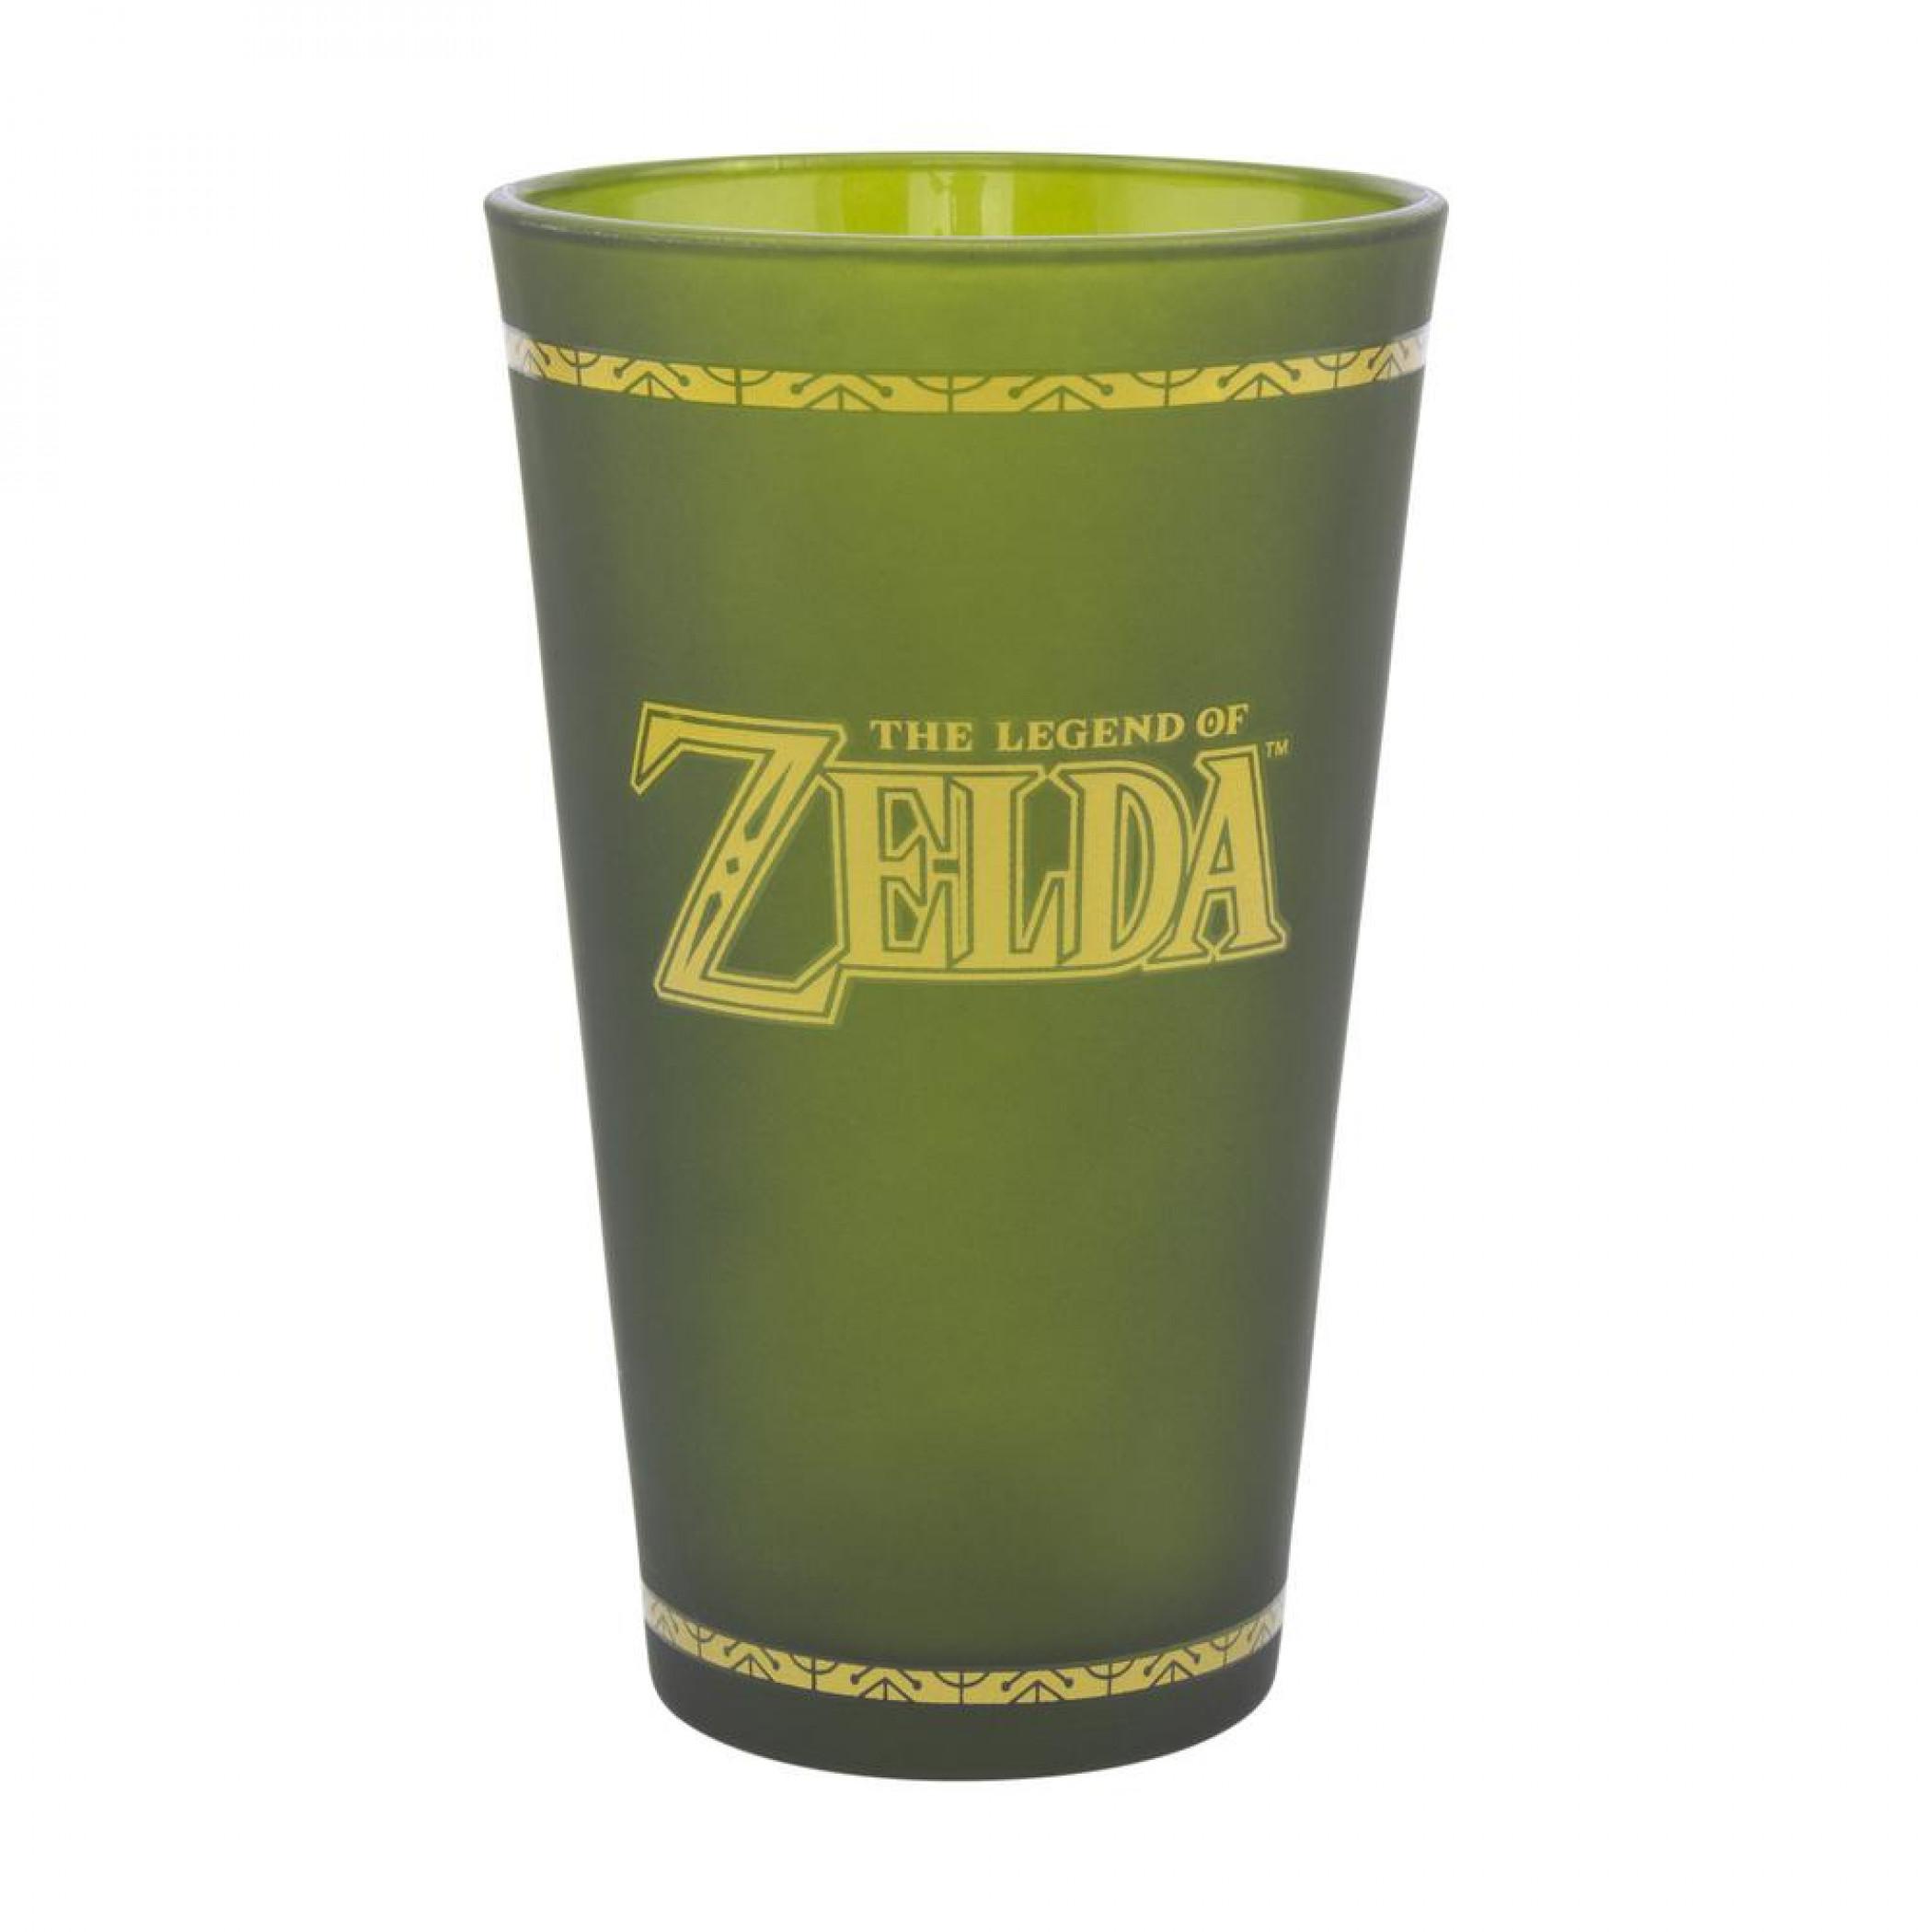 The Legend of Zelda Hyrule Crest Pint Glass